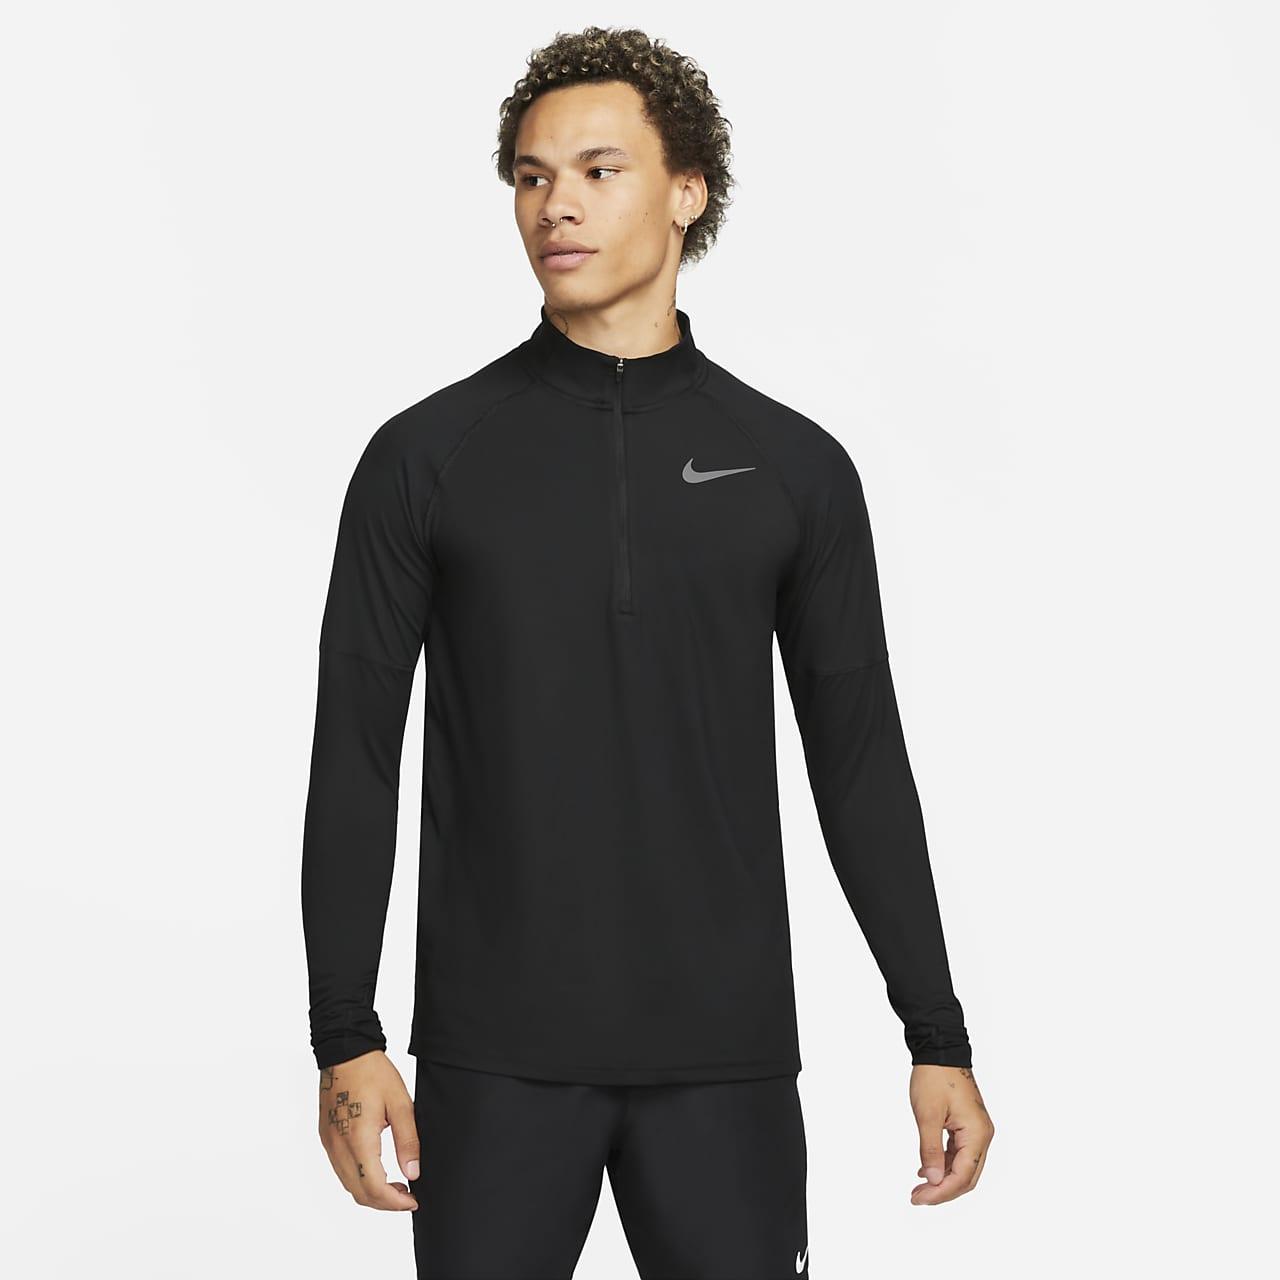 Nike Hardlooptop met halflange rits voor heren